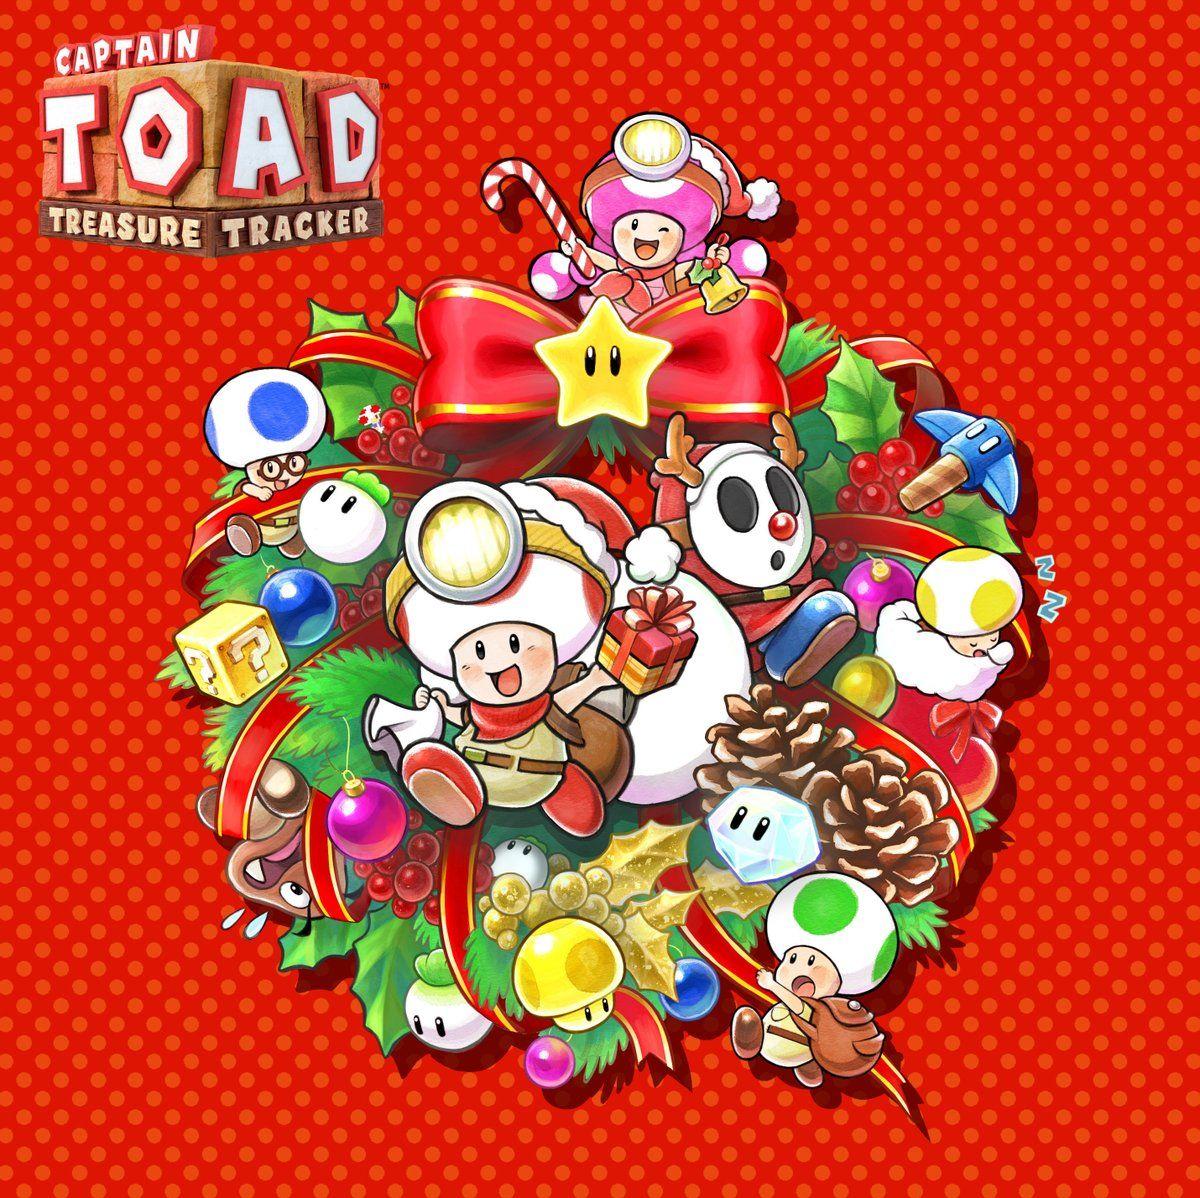 Nintendo Of America On Funny Christmas Wallpaper Nerdy Christmas Mario And Luigi